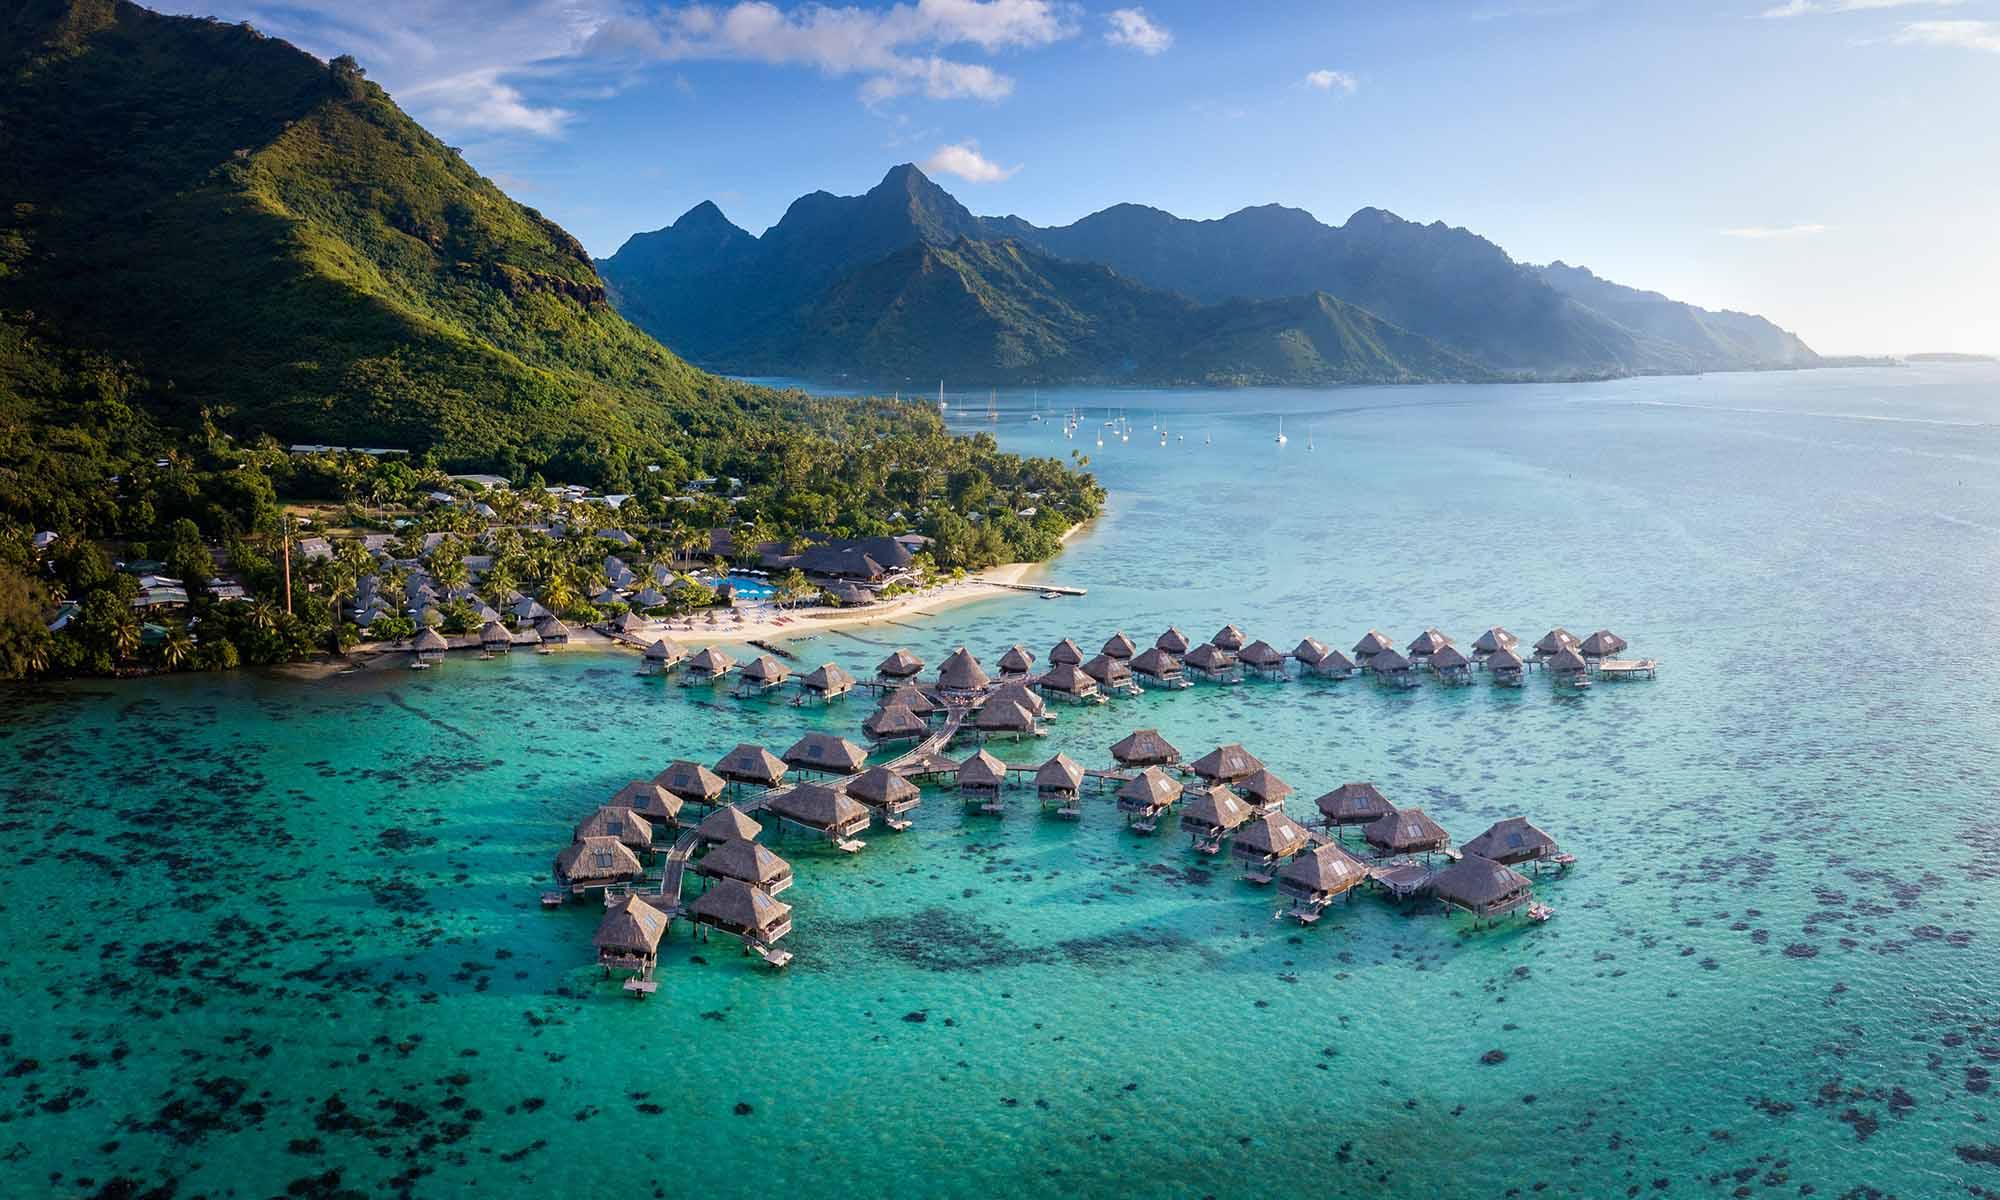 Hilton Moorea Lagoon Resort & Spa Promo Code - 20% Off Best